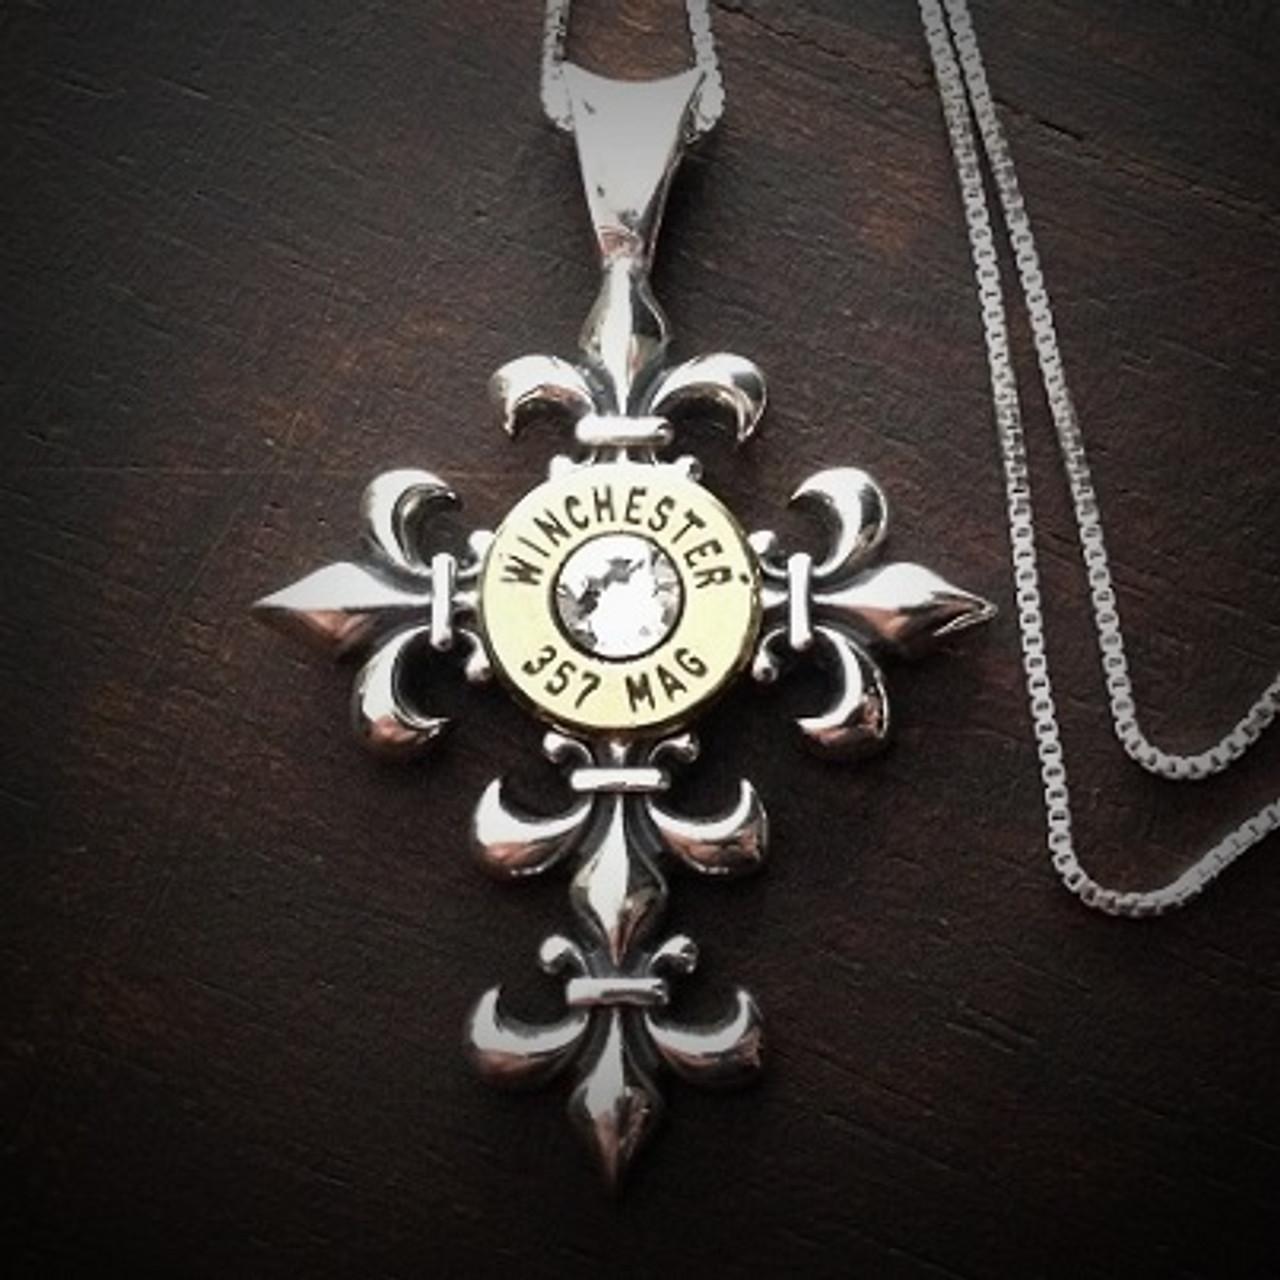 c6f04676f11 Fleury Cross Bullet Necklace in Sterling Silver - JECTZ